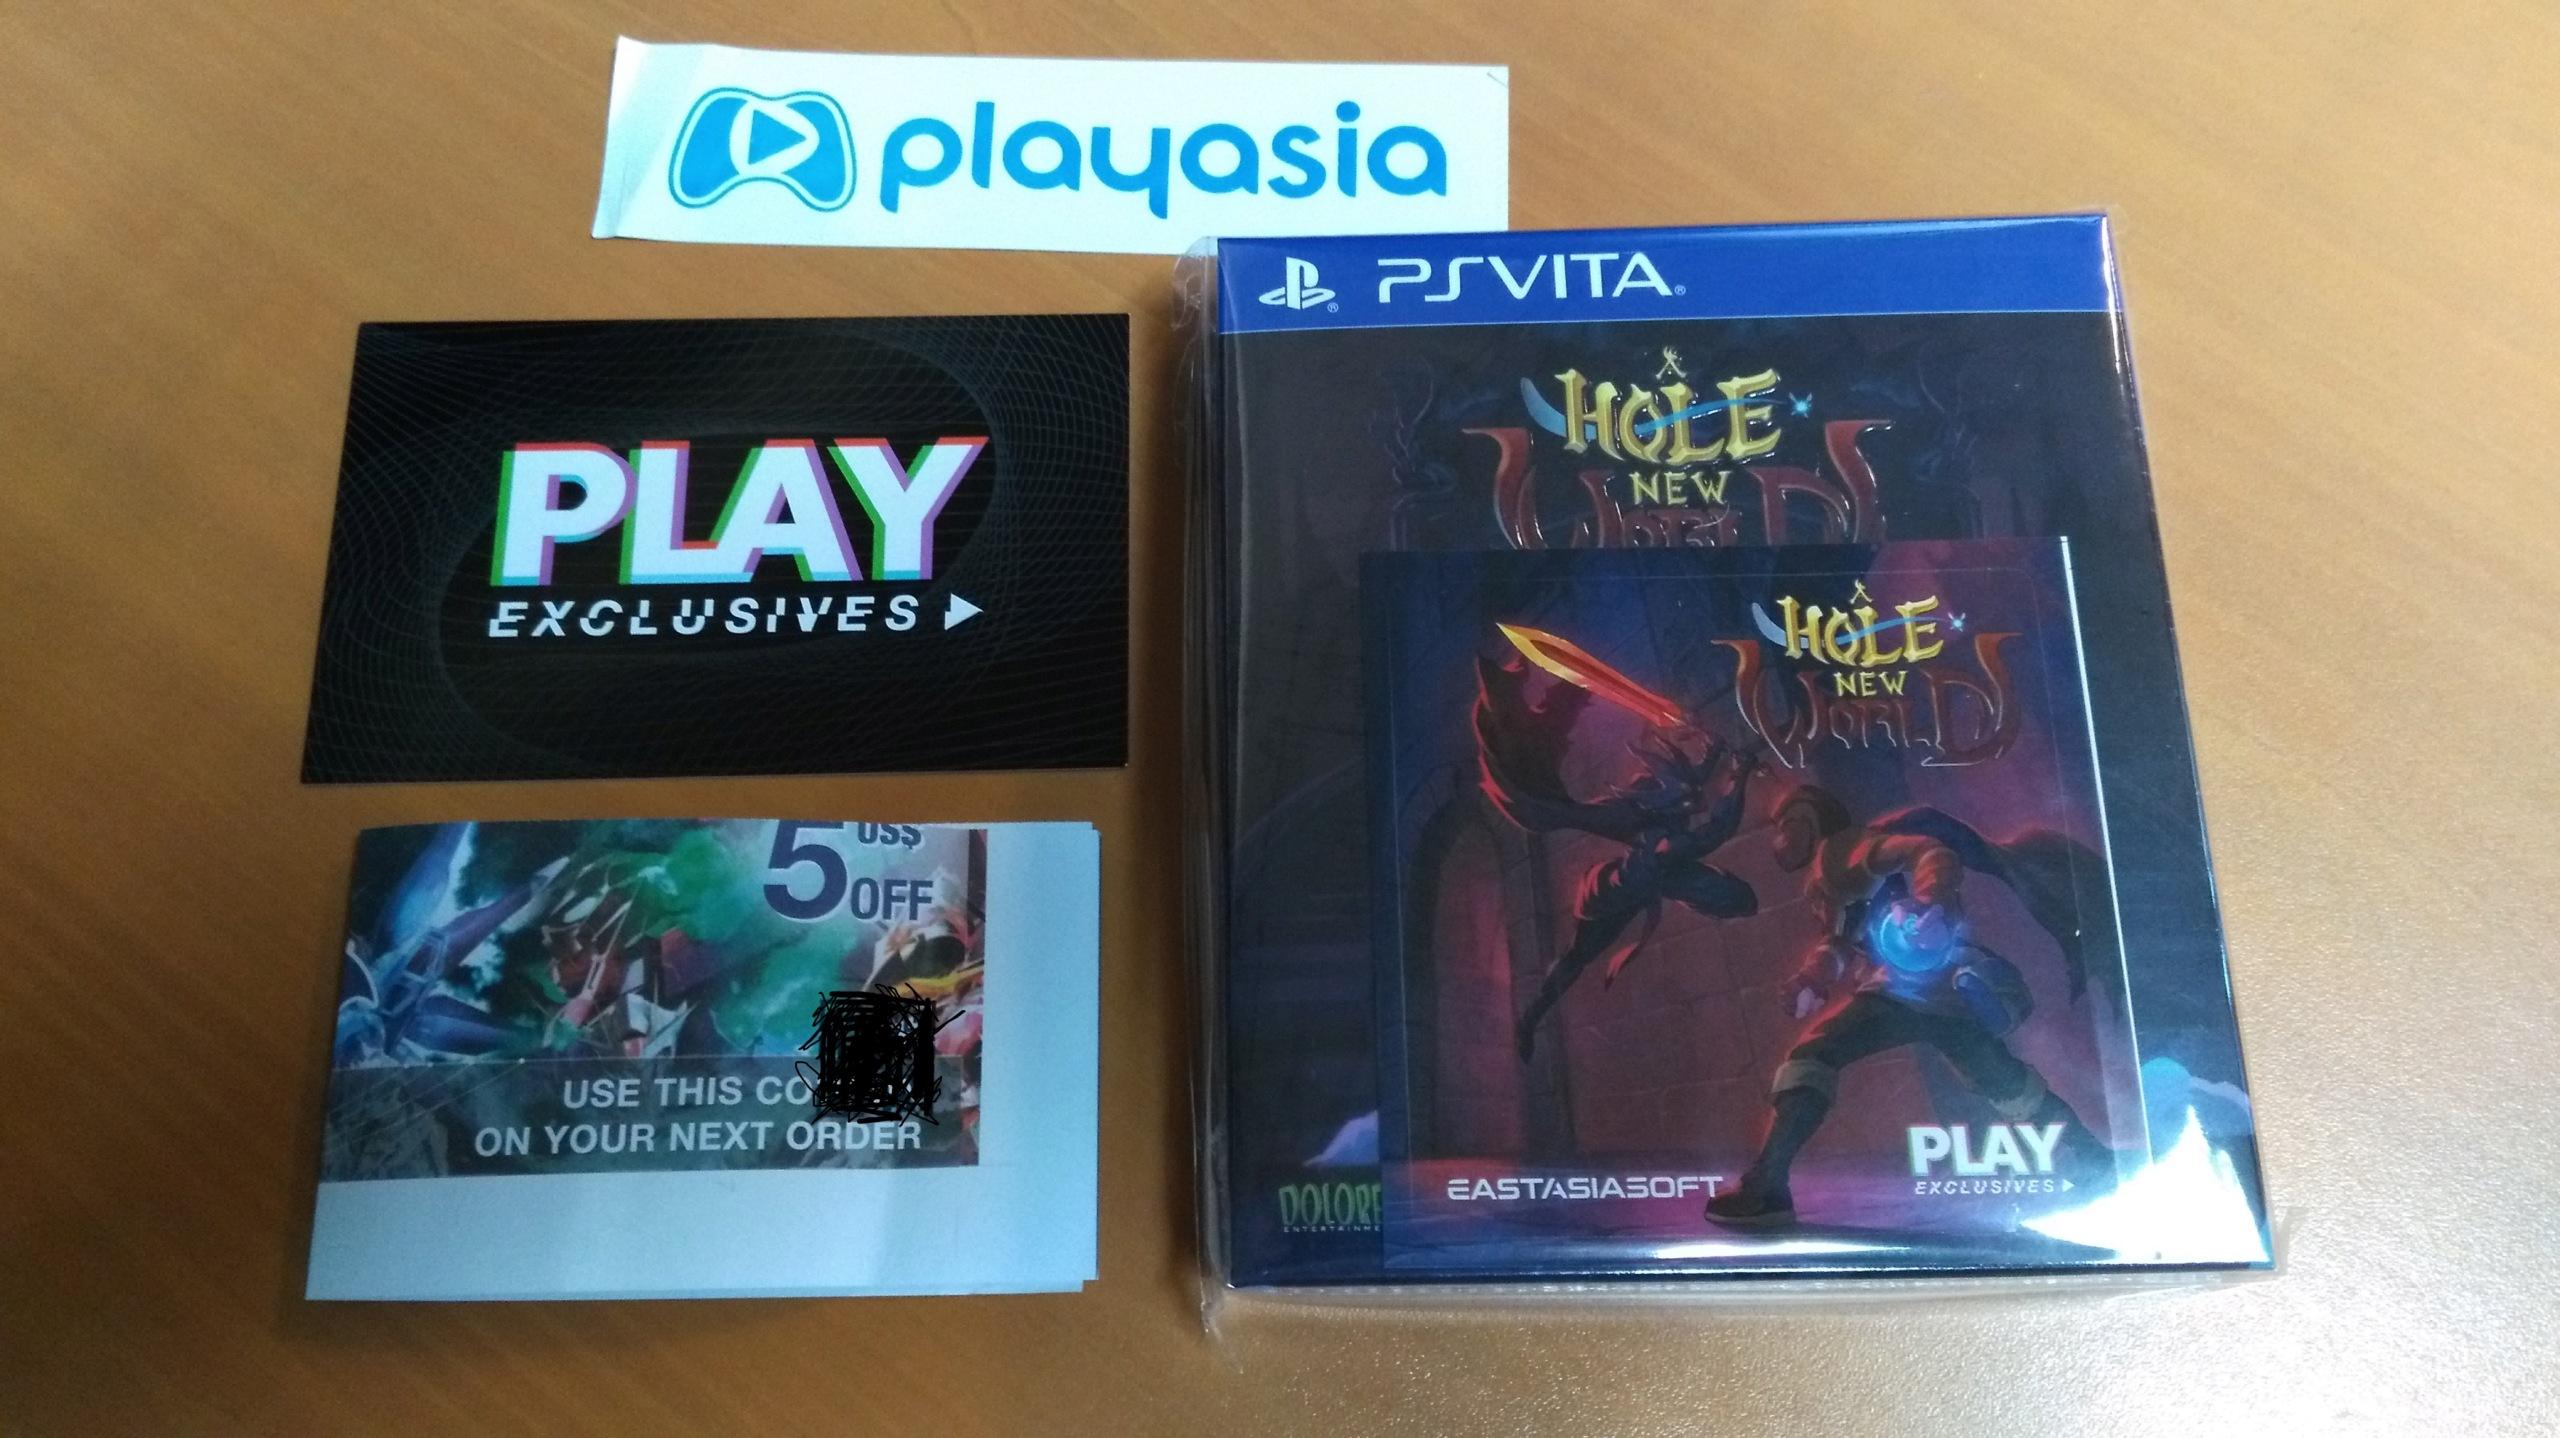 [VDS] A Hole new world Playasia VITA limited (Avec bon de 5$) Img_2014